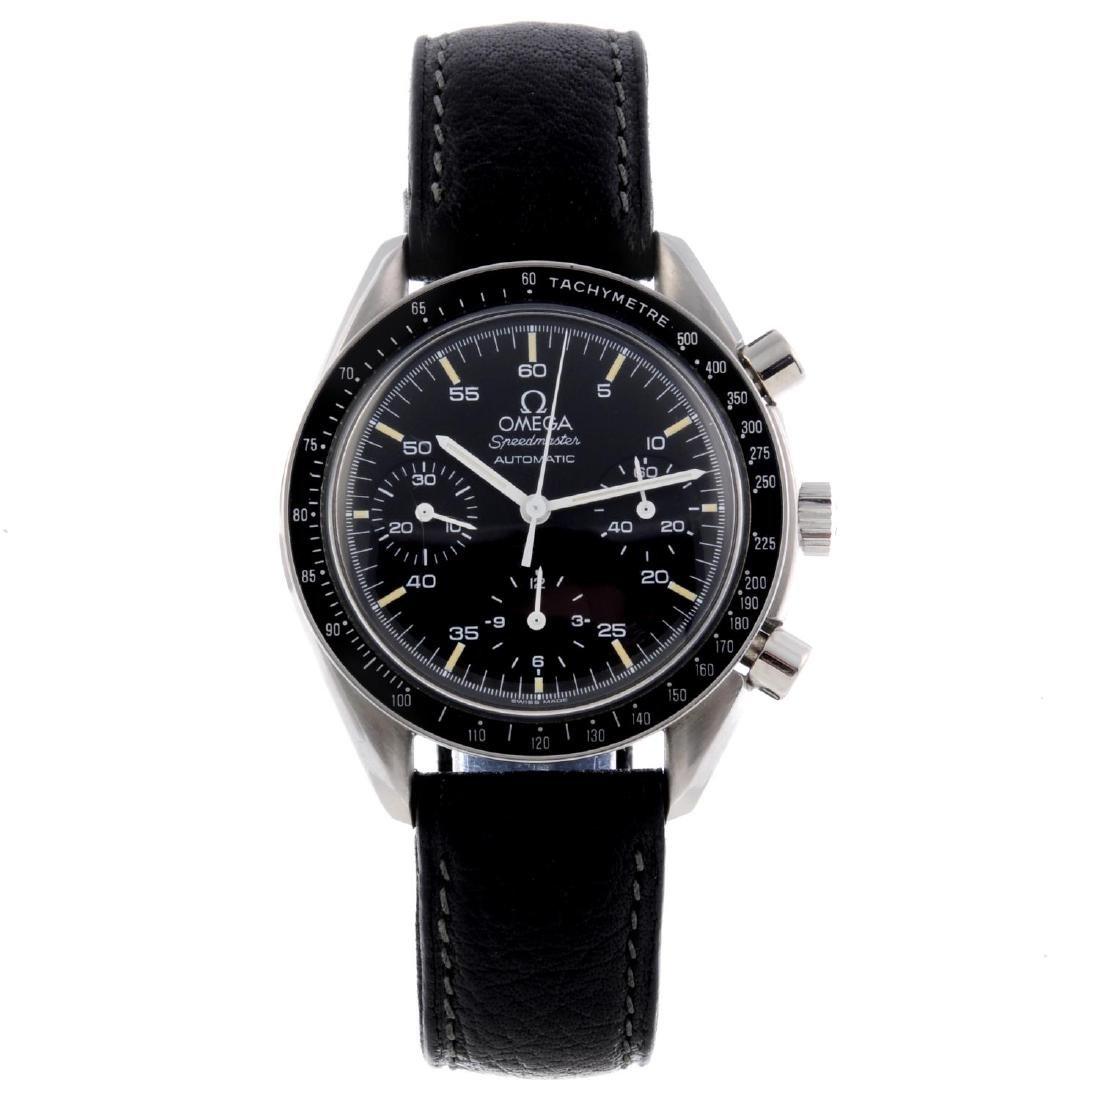 OMEGA - a gentleman's Speedmaster chronograph wrist